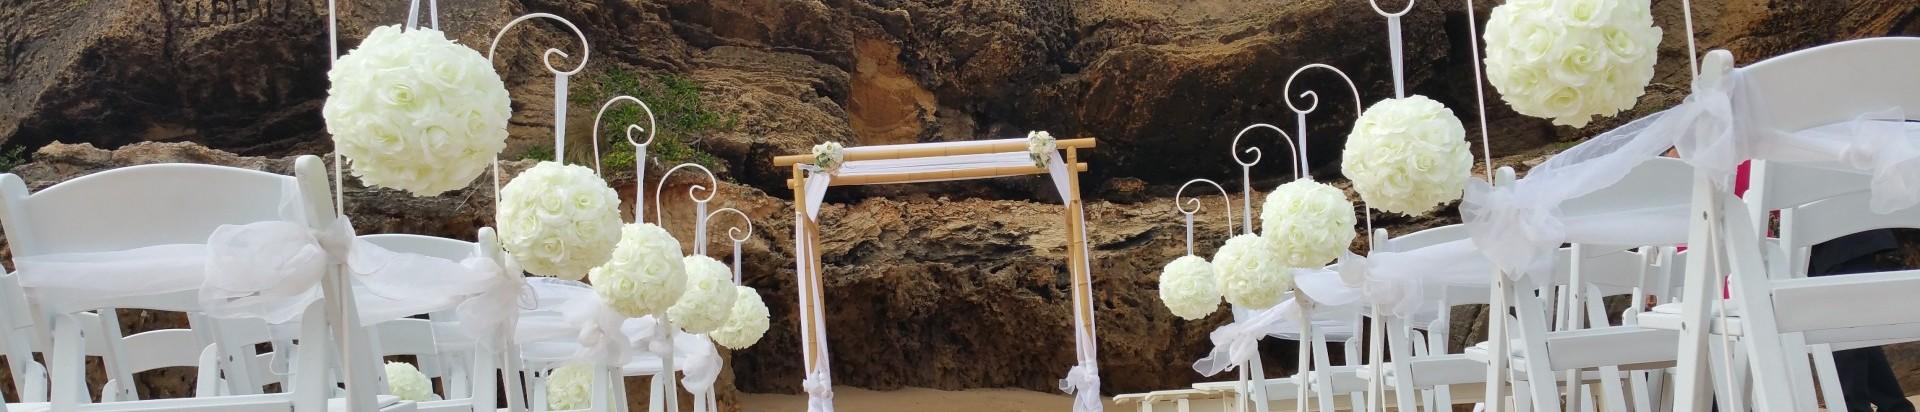 Barwon heads wedding ceremony